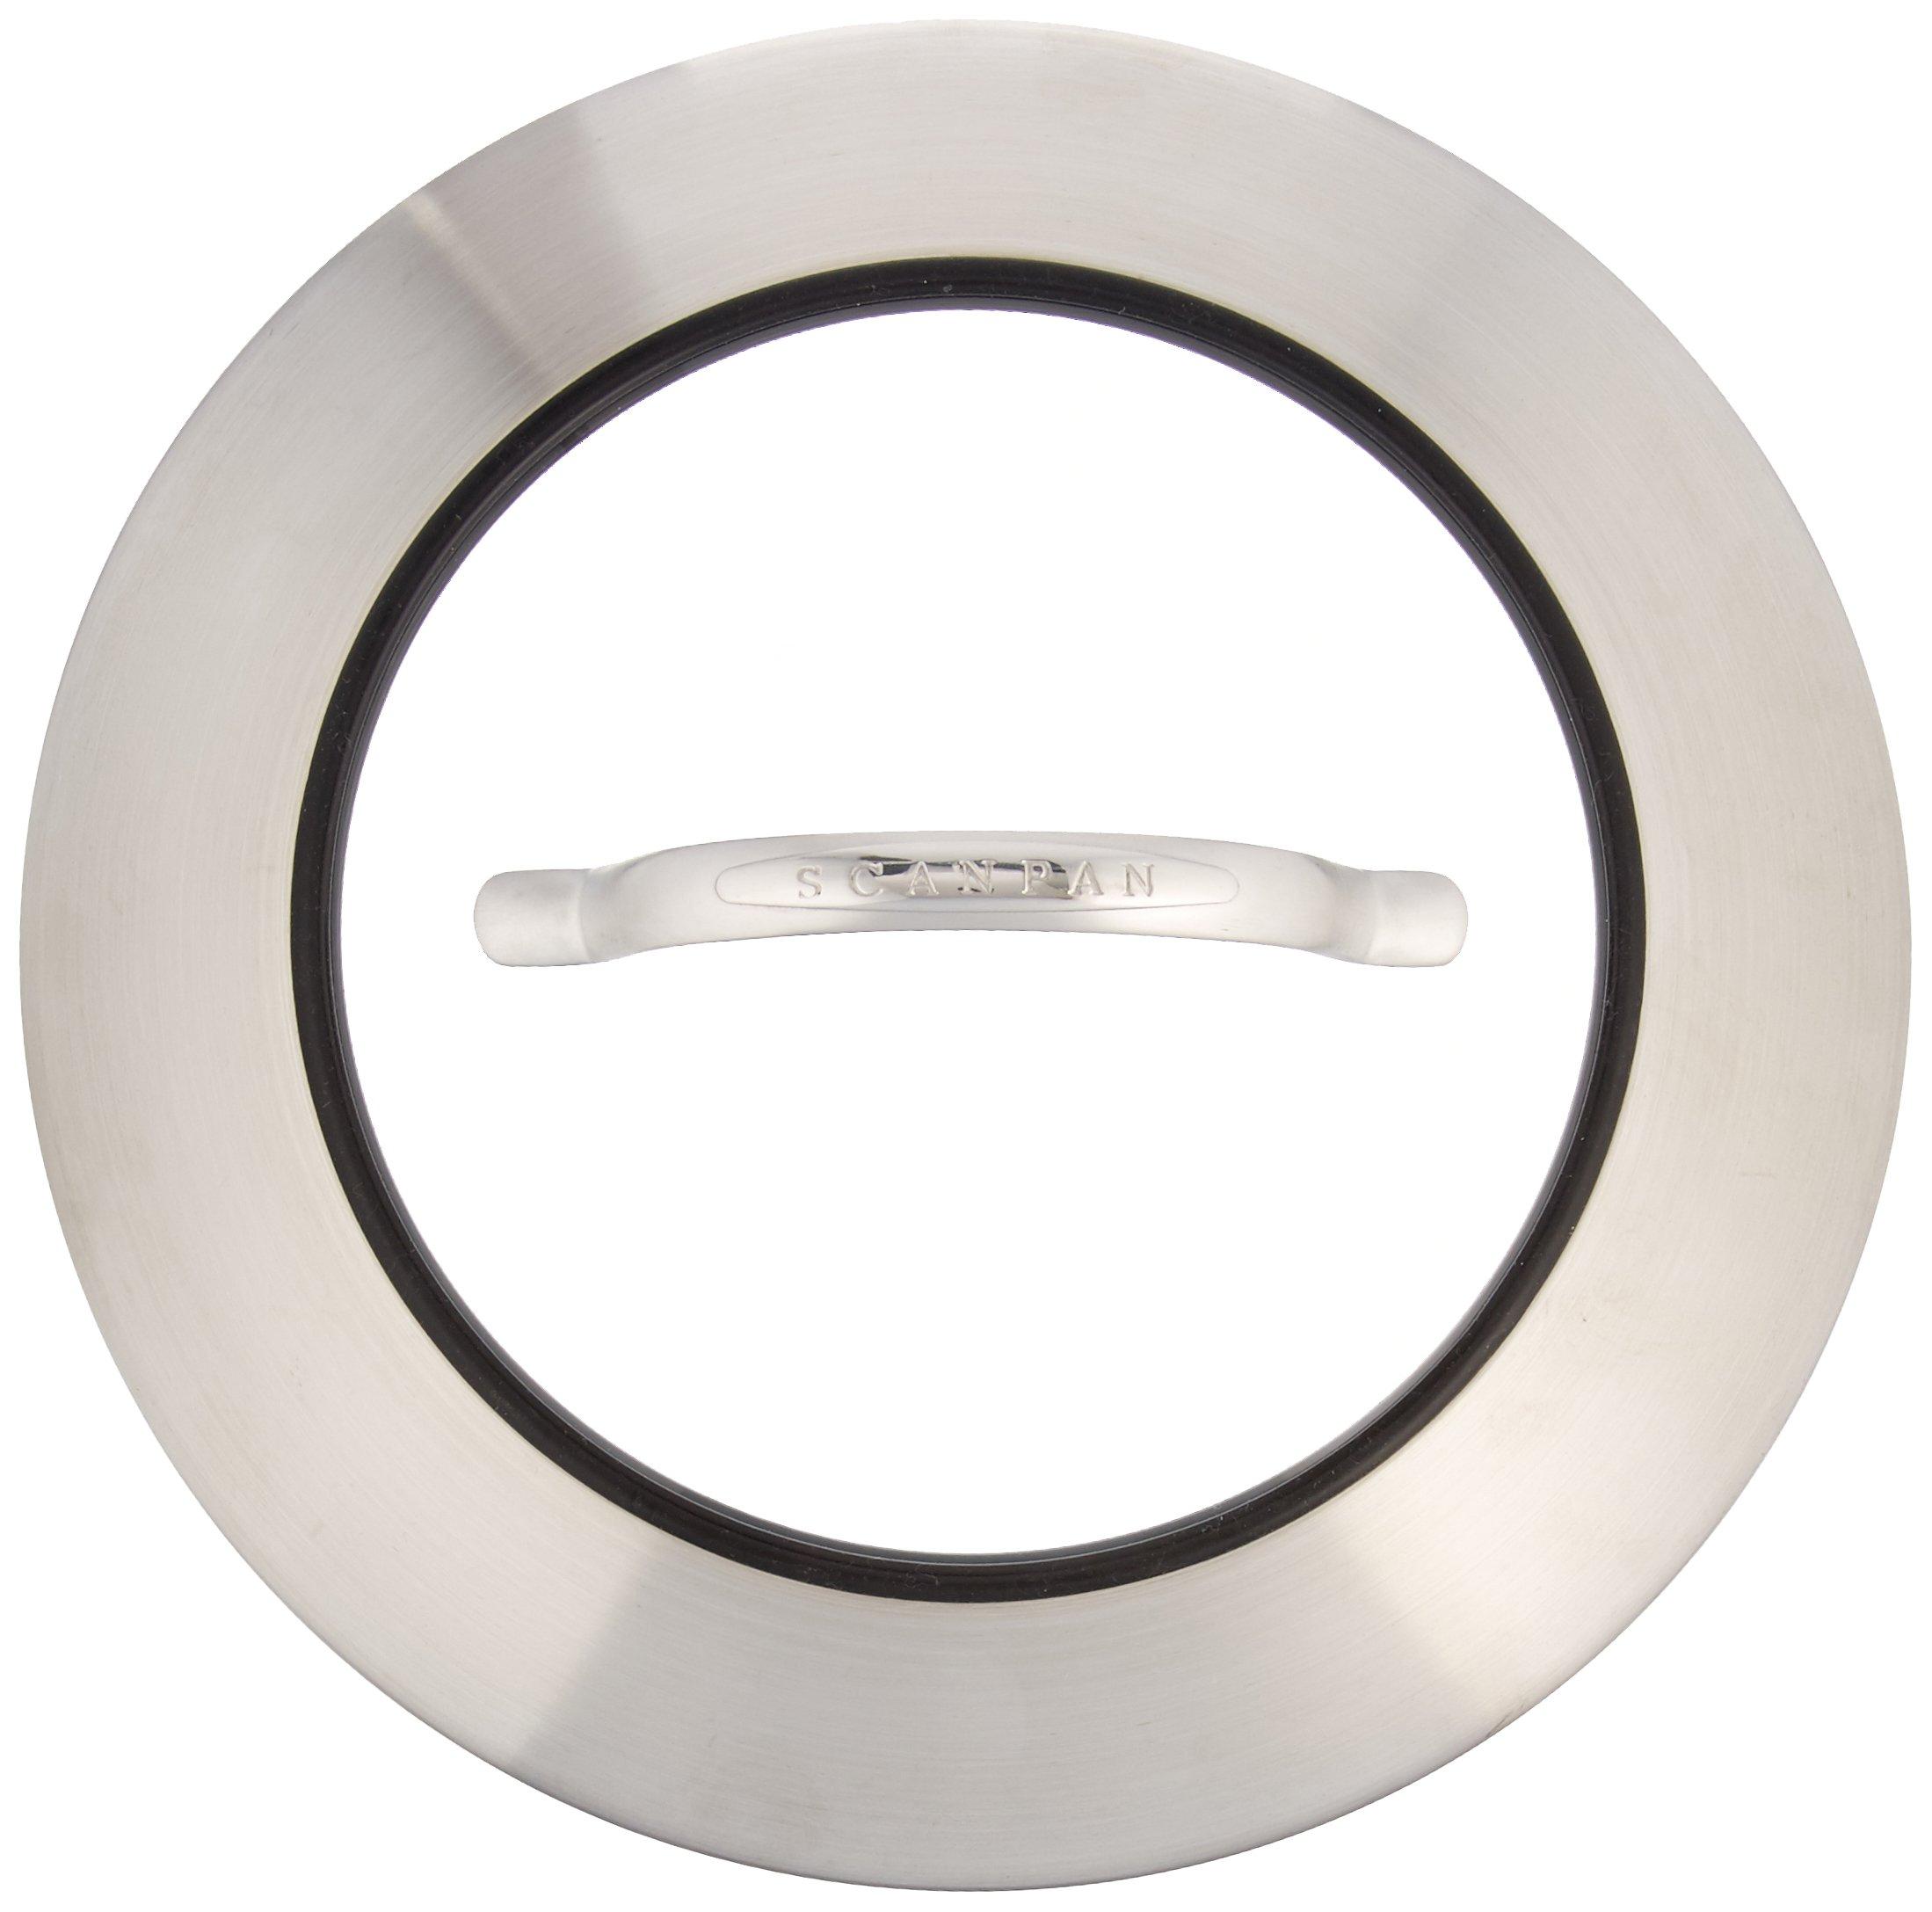 Scanpan CTX Stainless Steel/Glass Lid, 11''